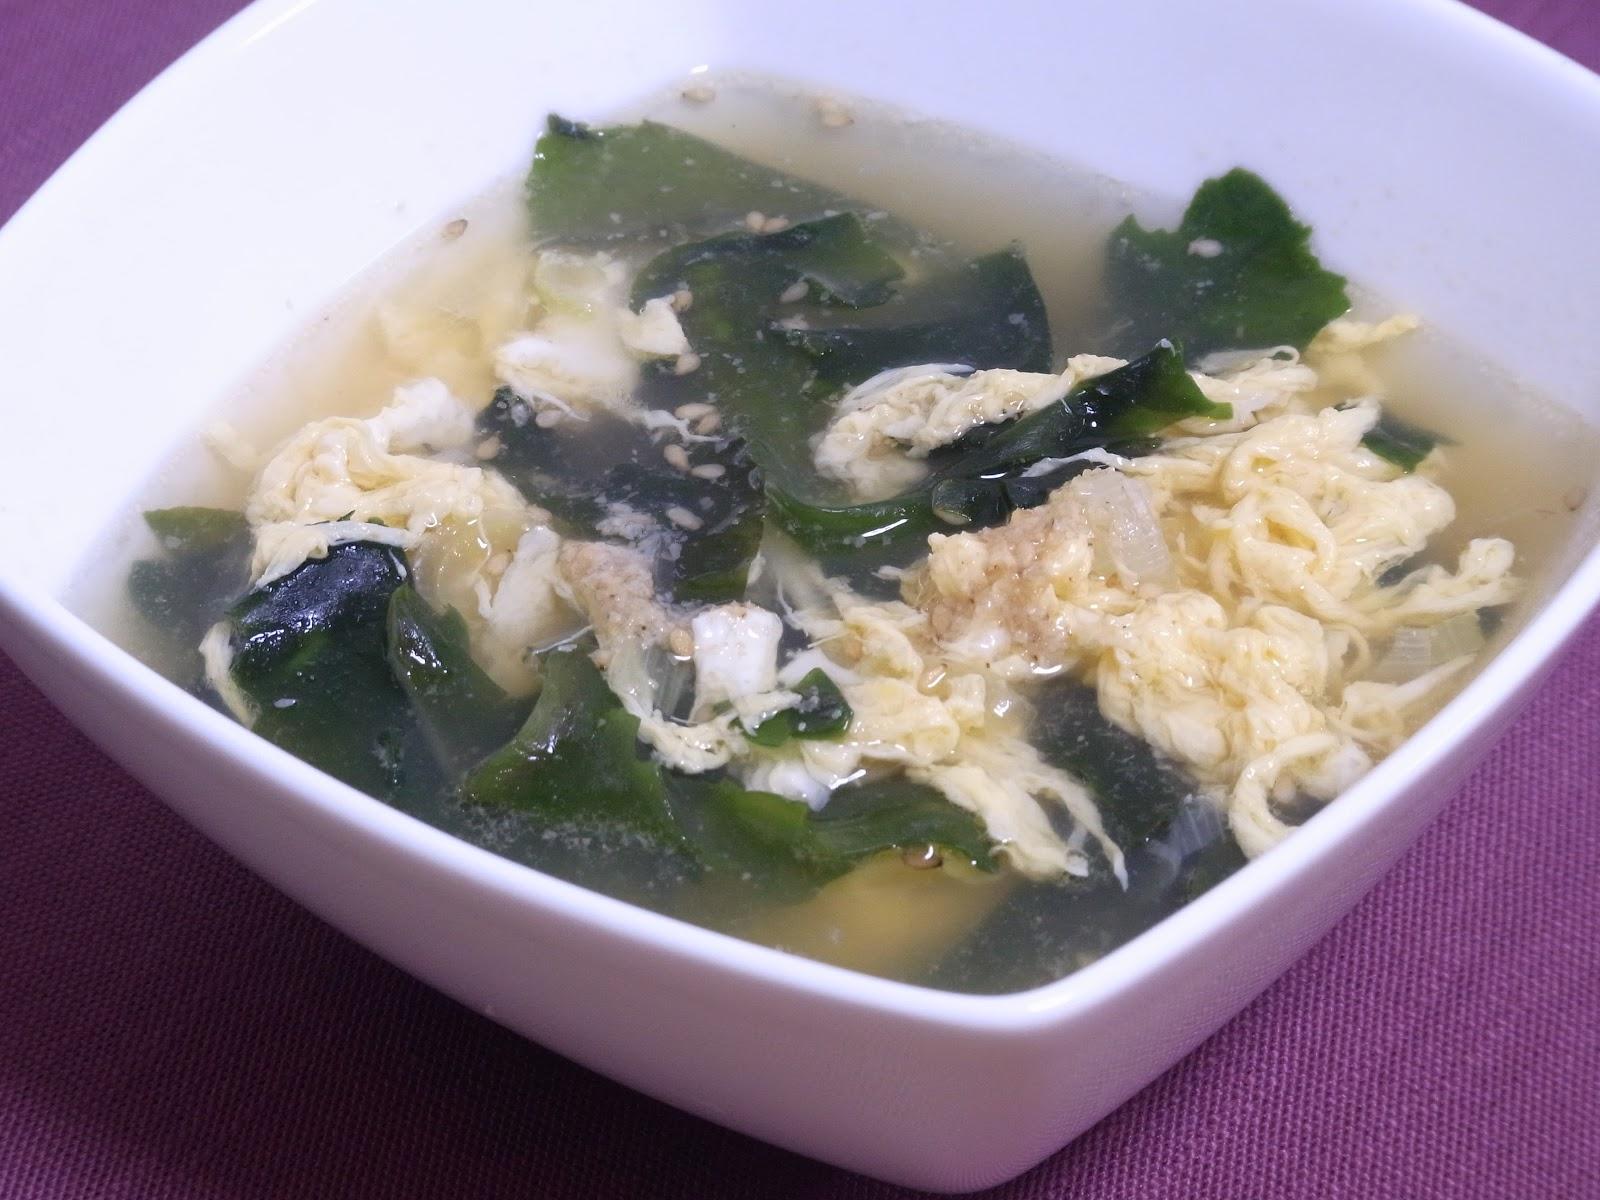 Miso and Yuzu: Korean-style egg & wakame soup